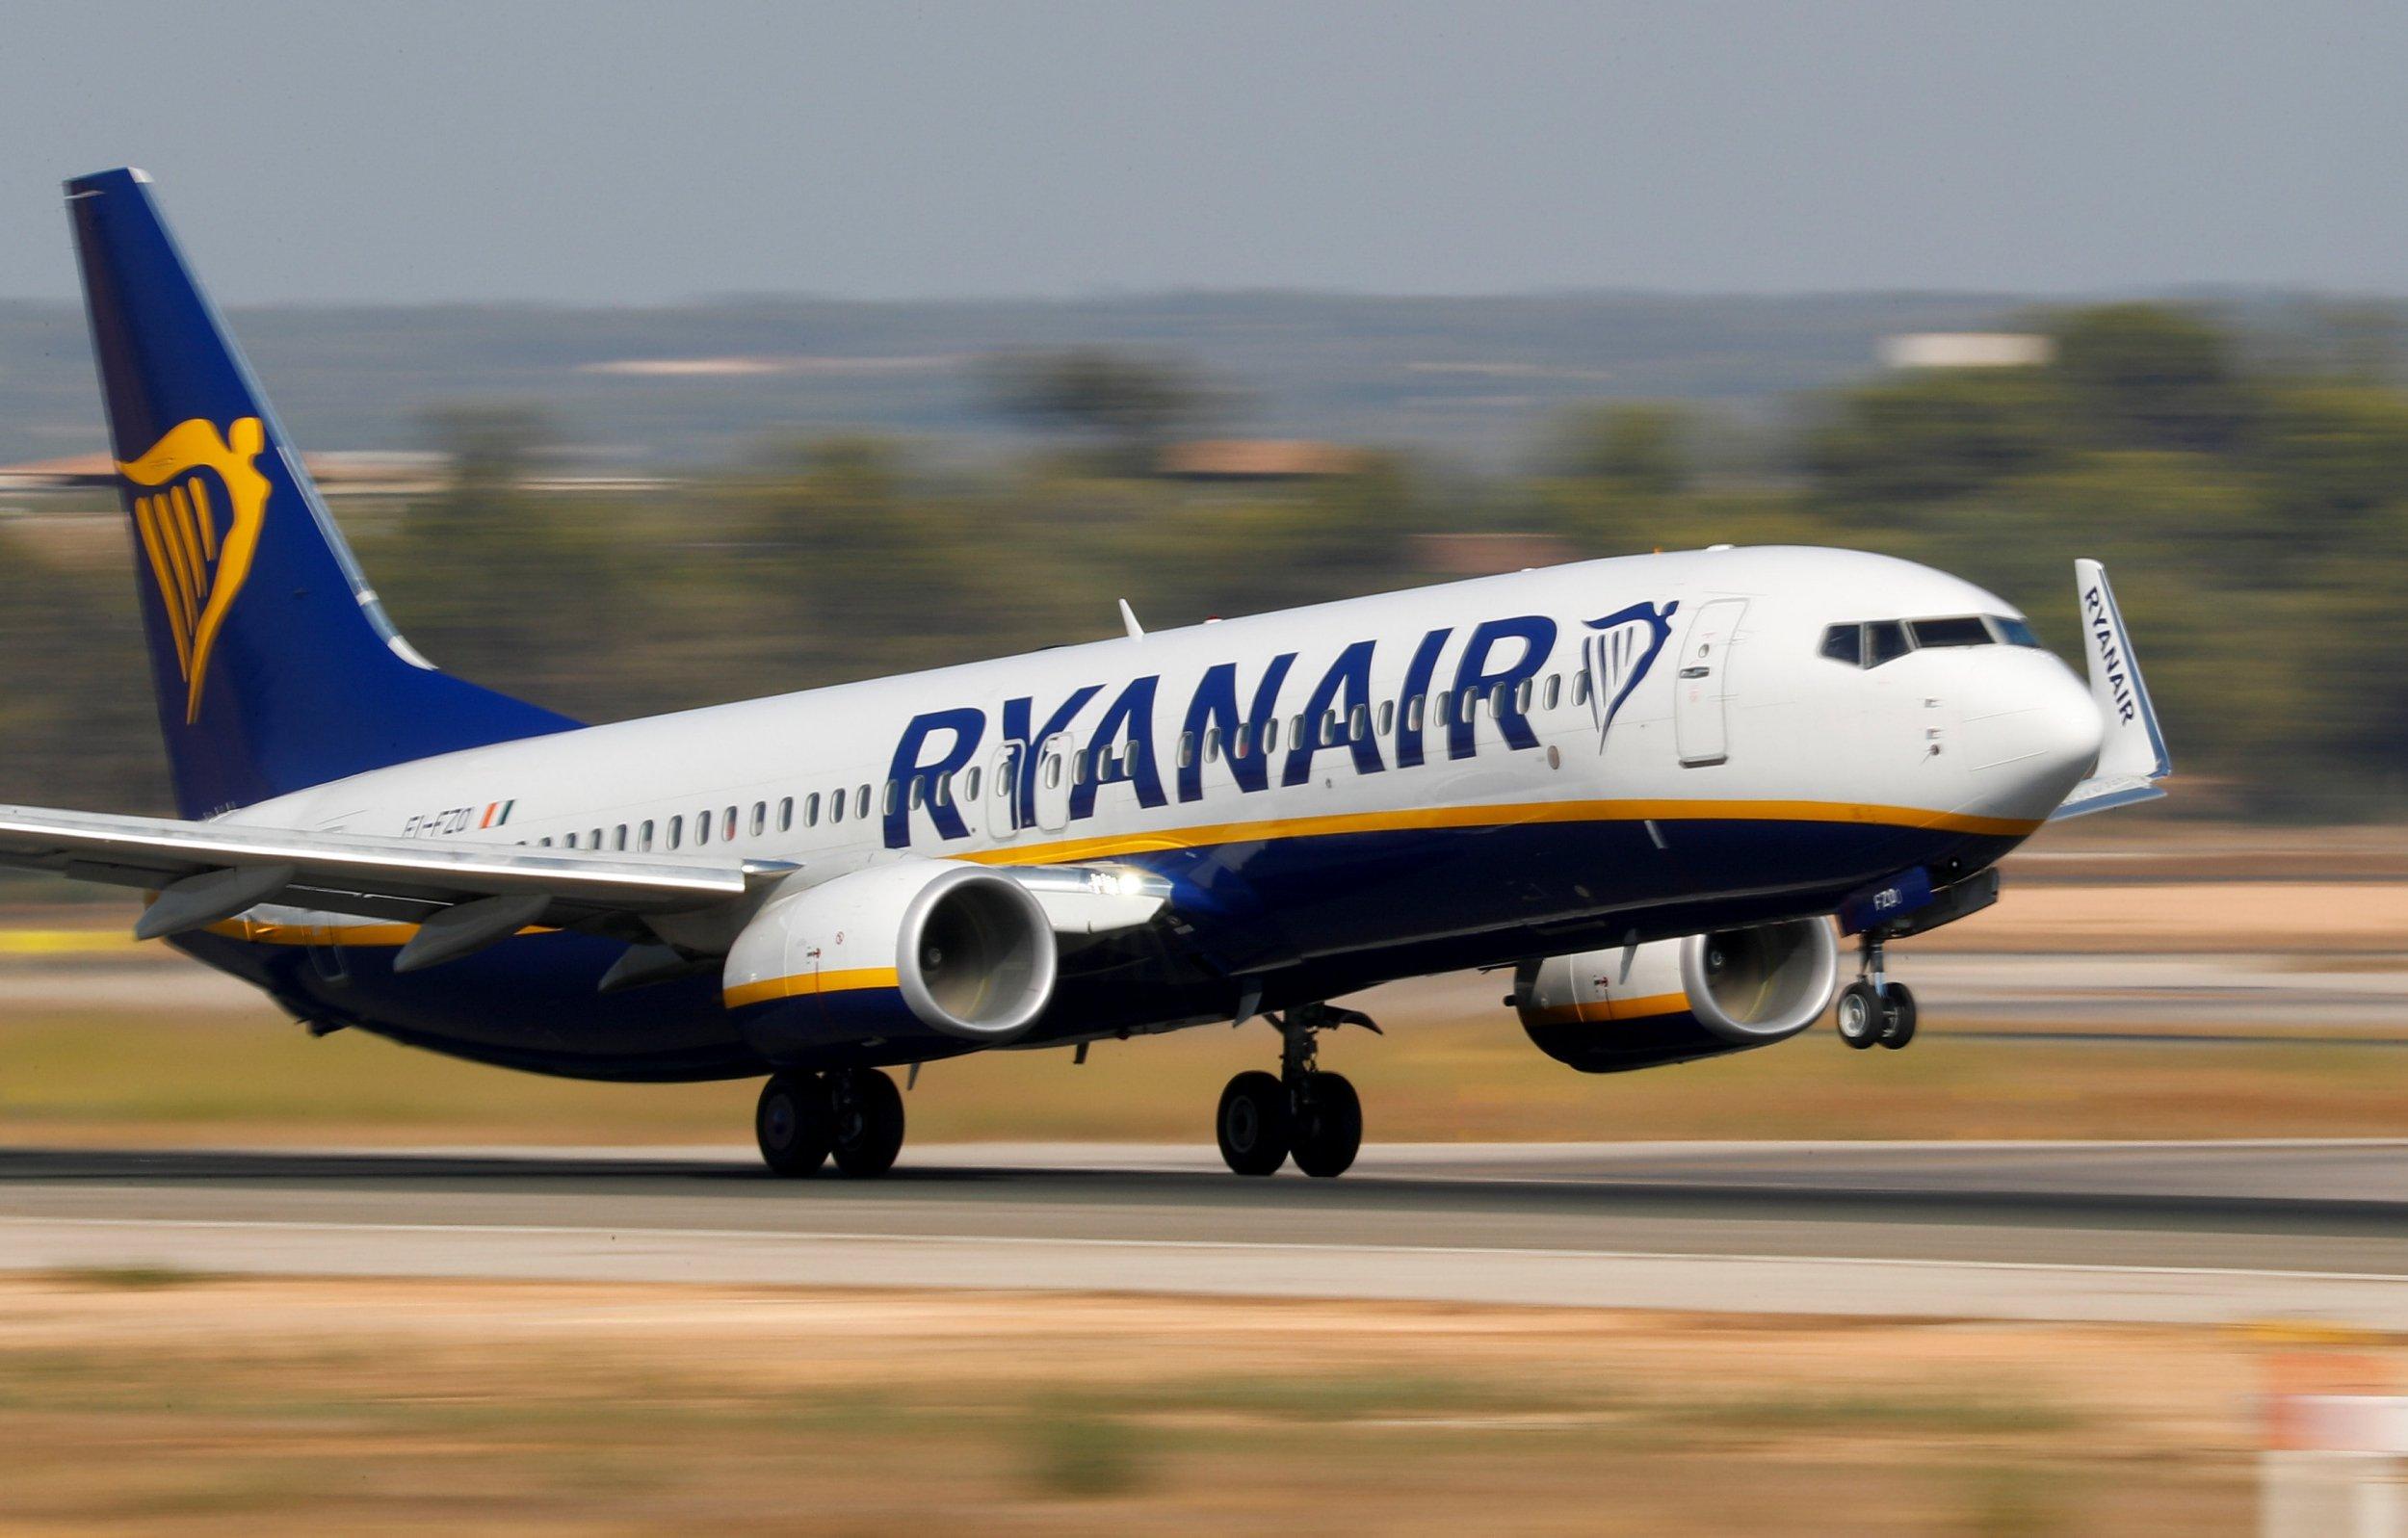 """Самая чистая и зеленая"" авиакомпания Ryanair названа крупнейшим загрязн..."